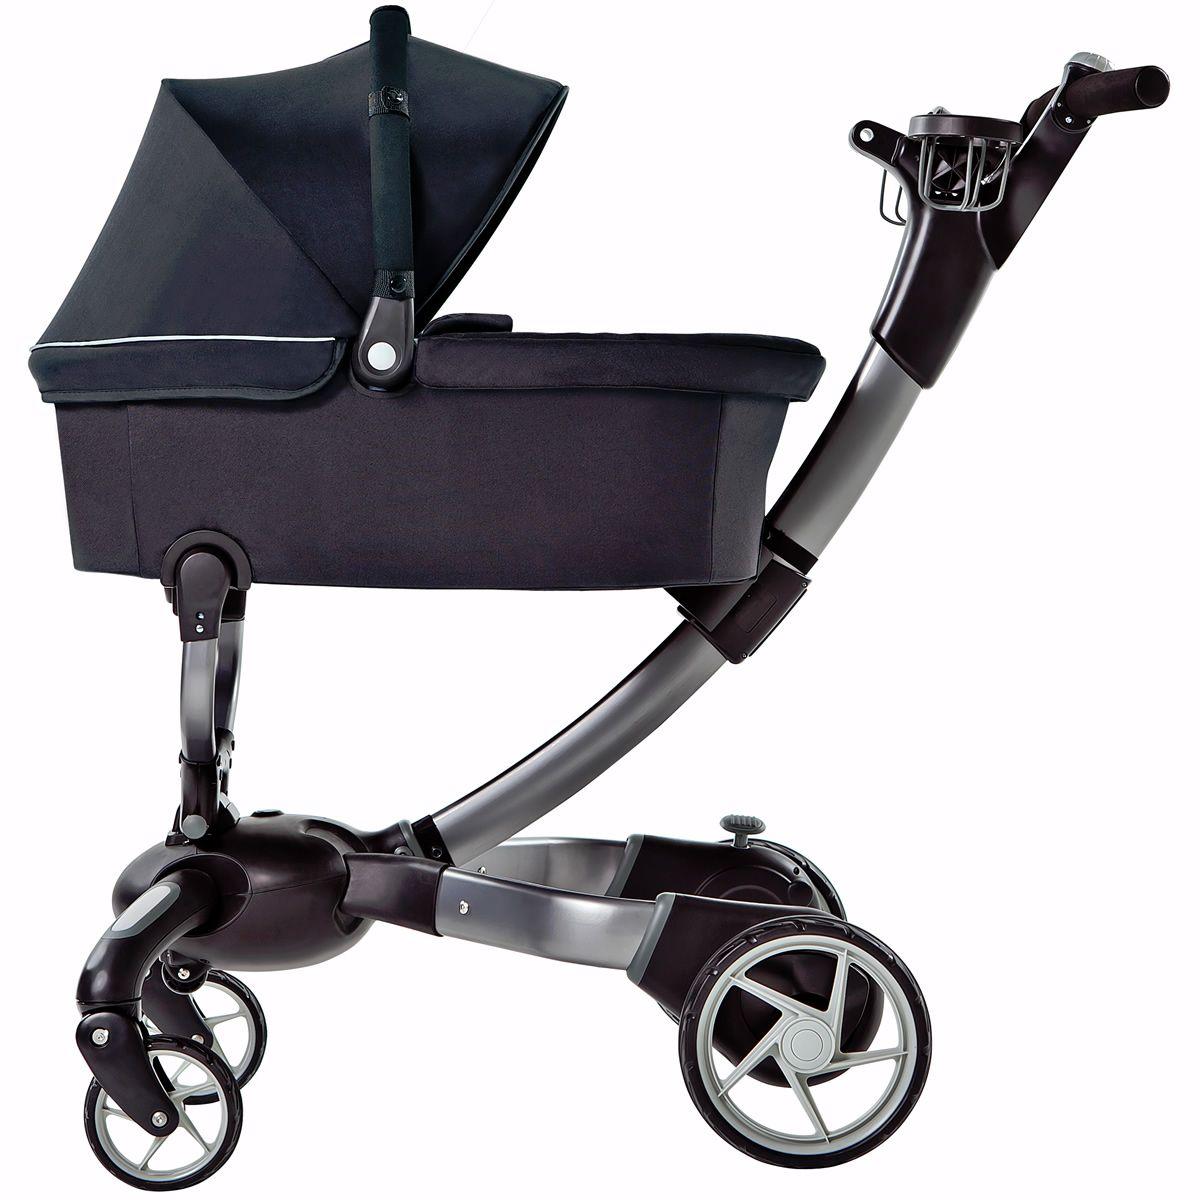 4Moms Origami Baby strollers, Origami stroller